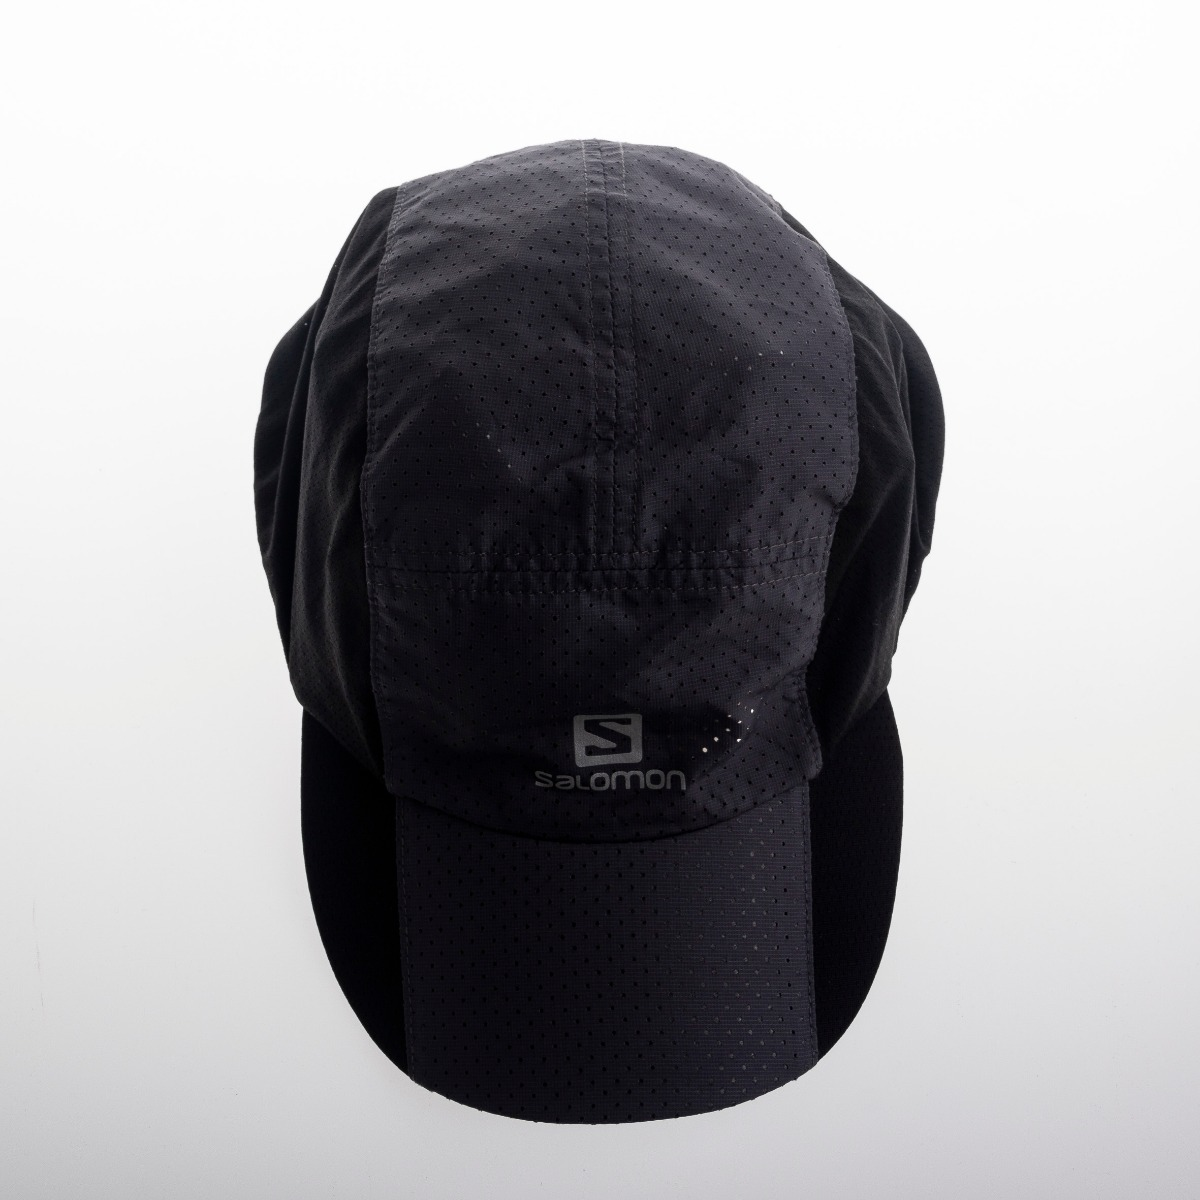 134f0deb7a559 gorra outdoor salomon xt compact cap bkl unisex on sports. Cargando zoom.